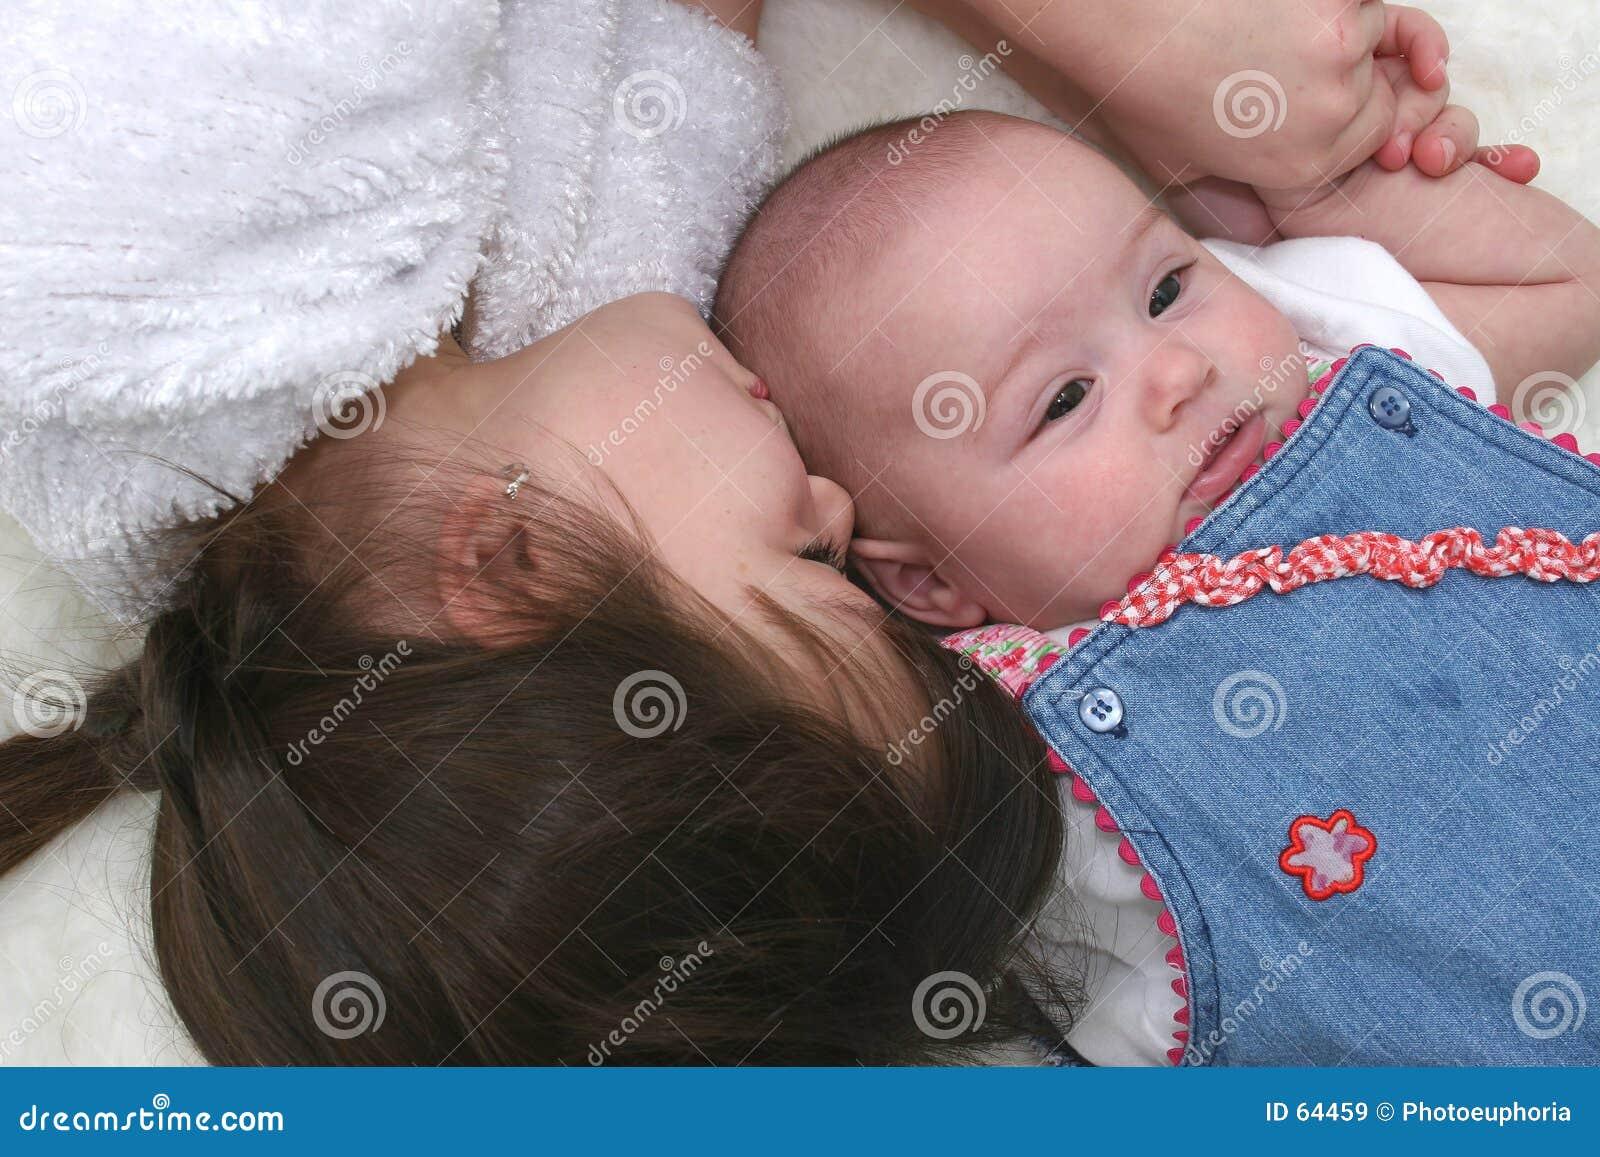 Download 01 αδελφές στοκ εικόνα. εικόνα από αδελφές, ευτυχής, αγάπη - 64459